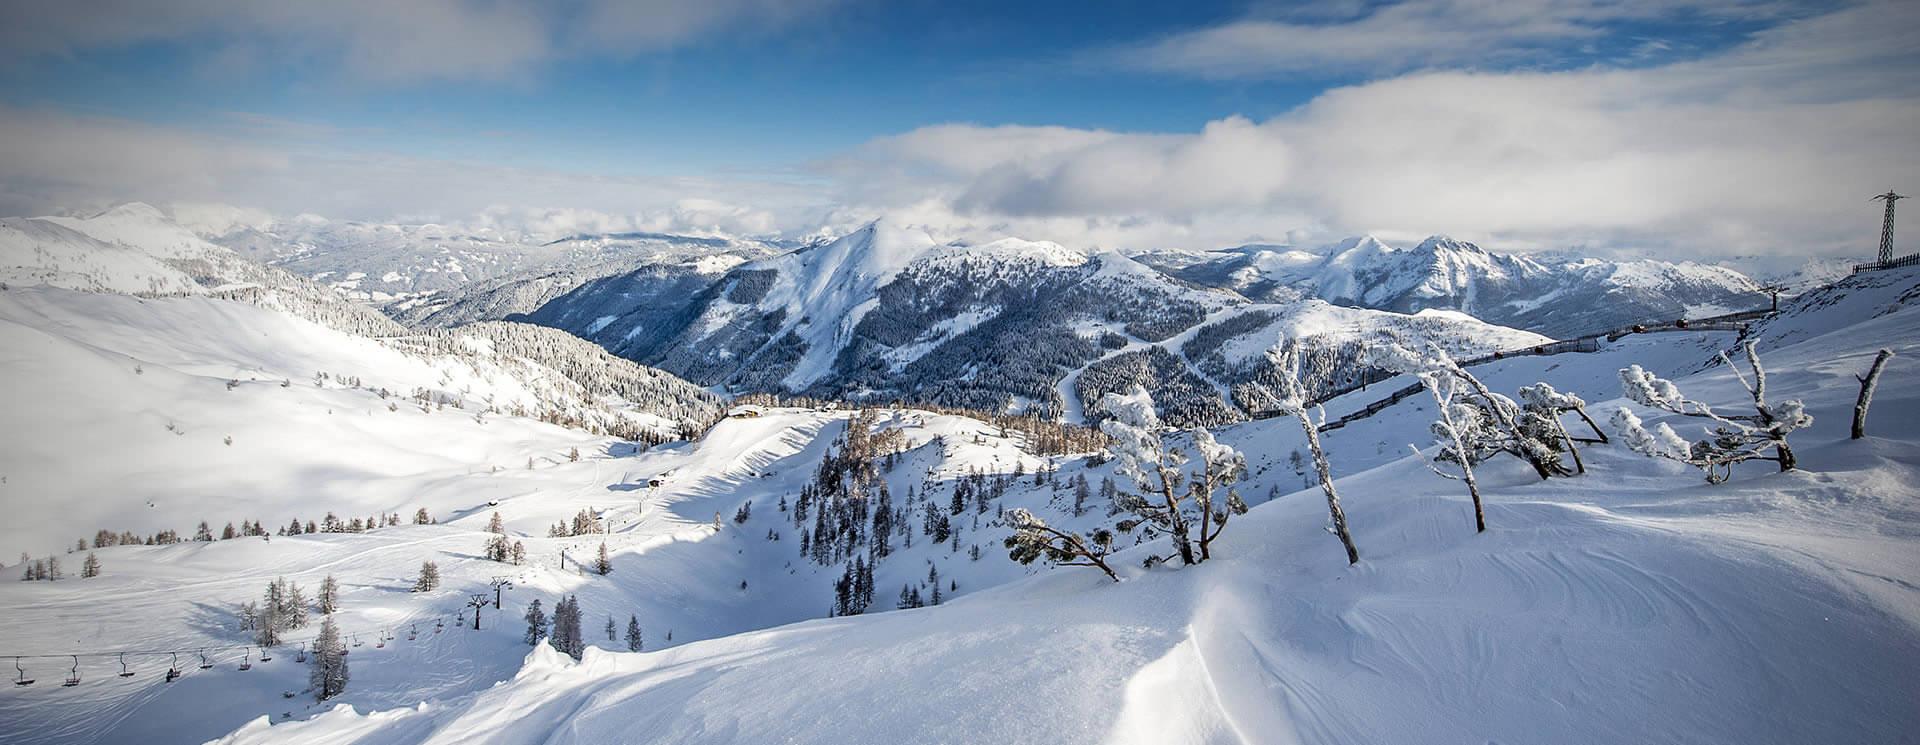 Ski holiday in zauchensee salzburger land 4 s hotel for Designhotel skifahren